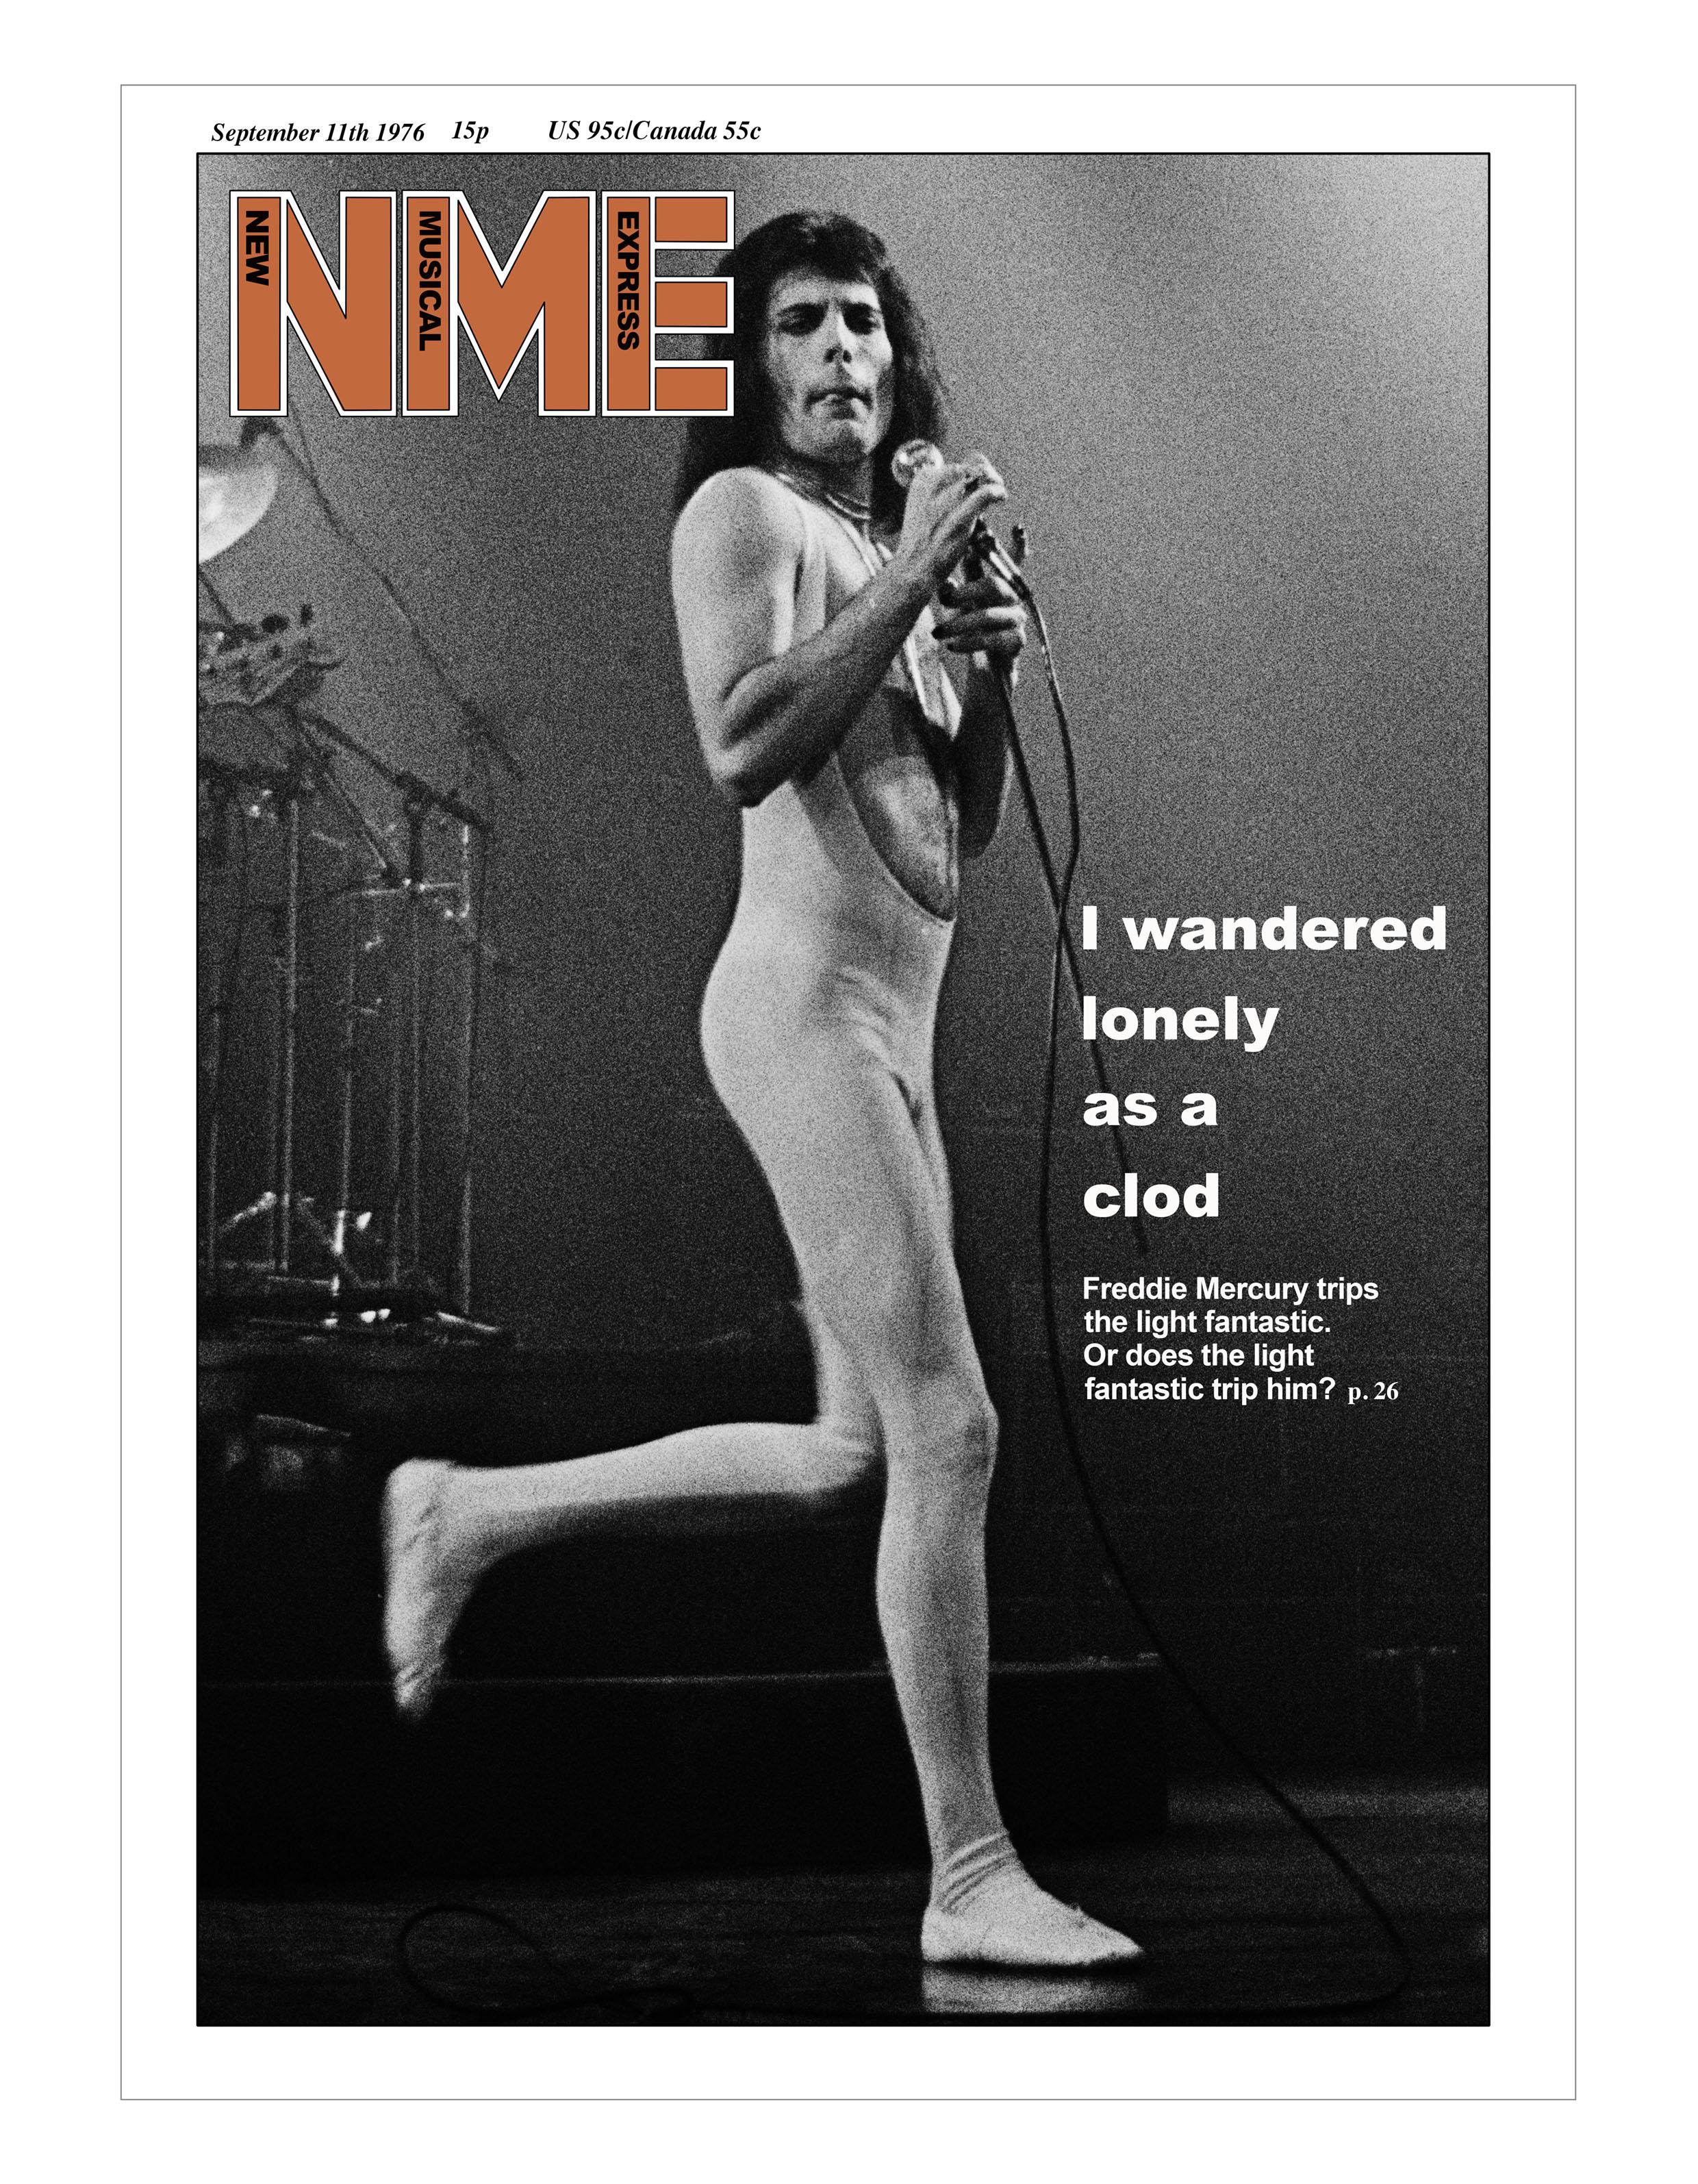 Queen NME cover catalog.jpg